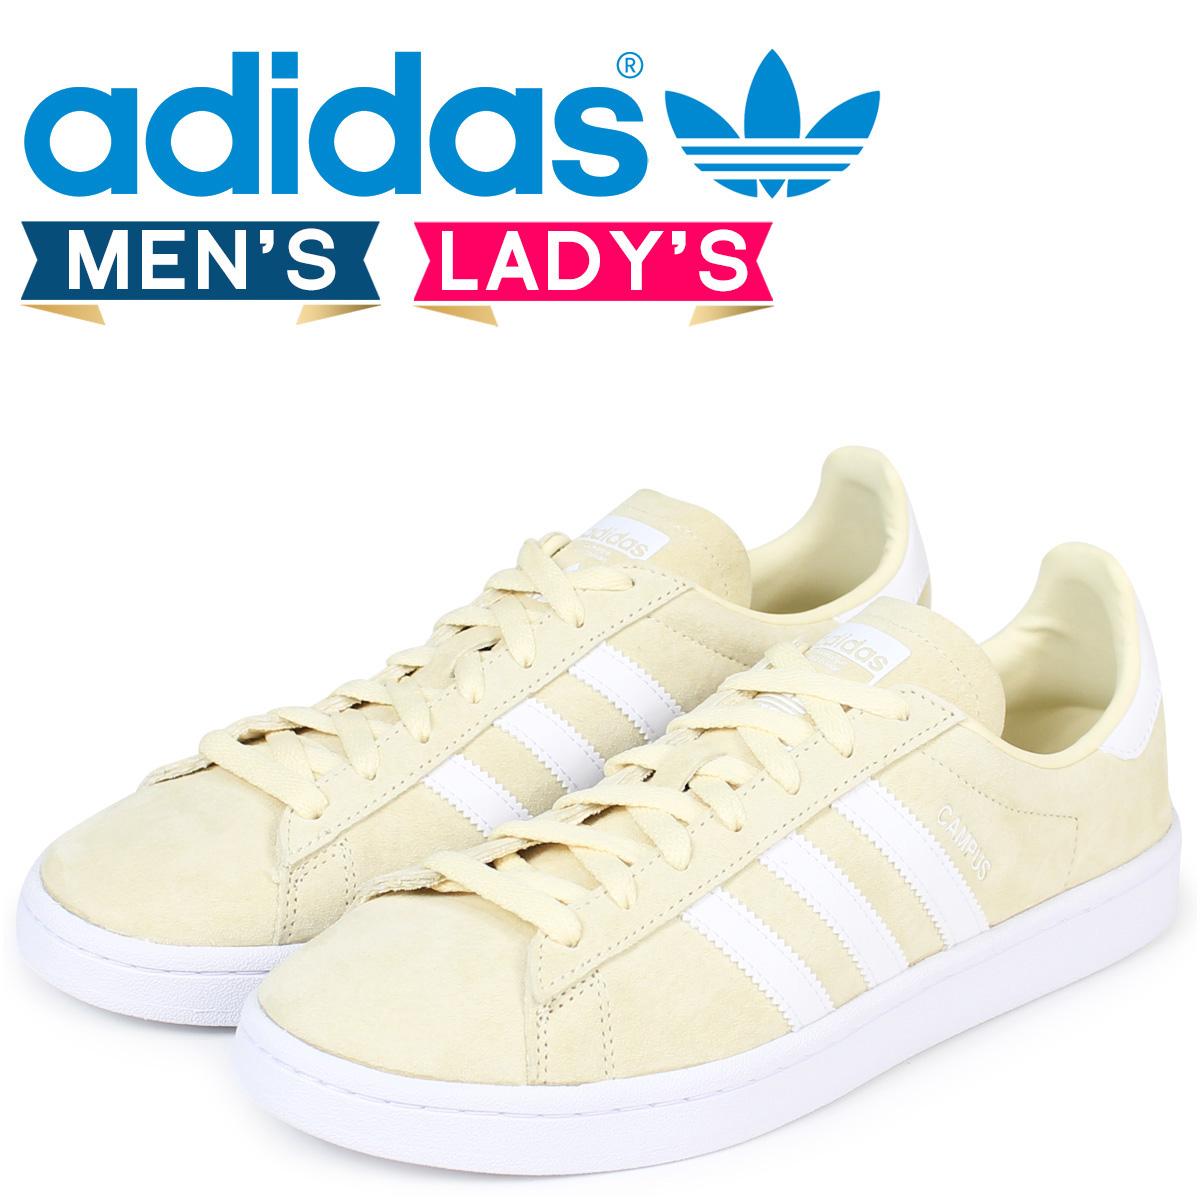 adidas Campus Shoes Yellow | Women's & Men's Originals